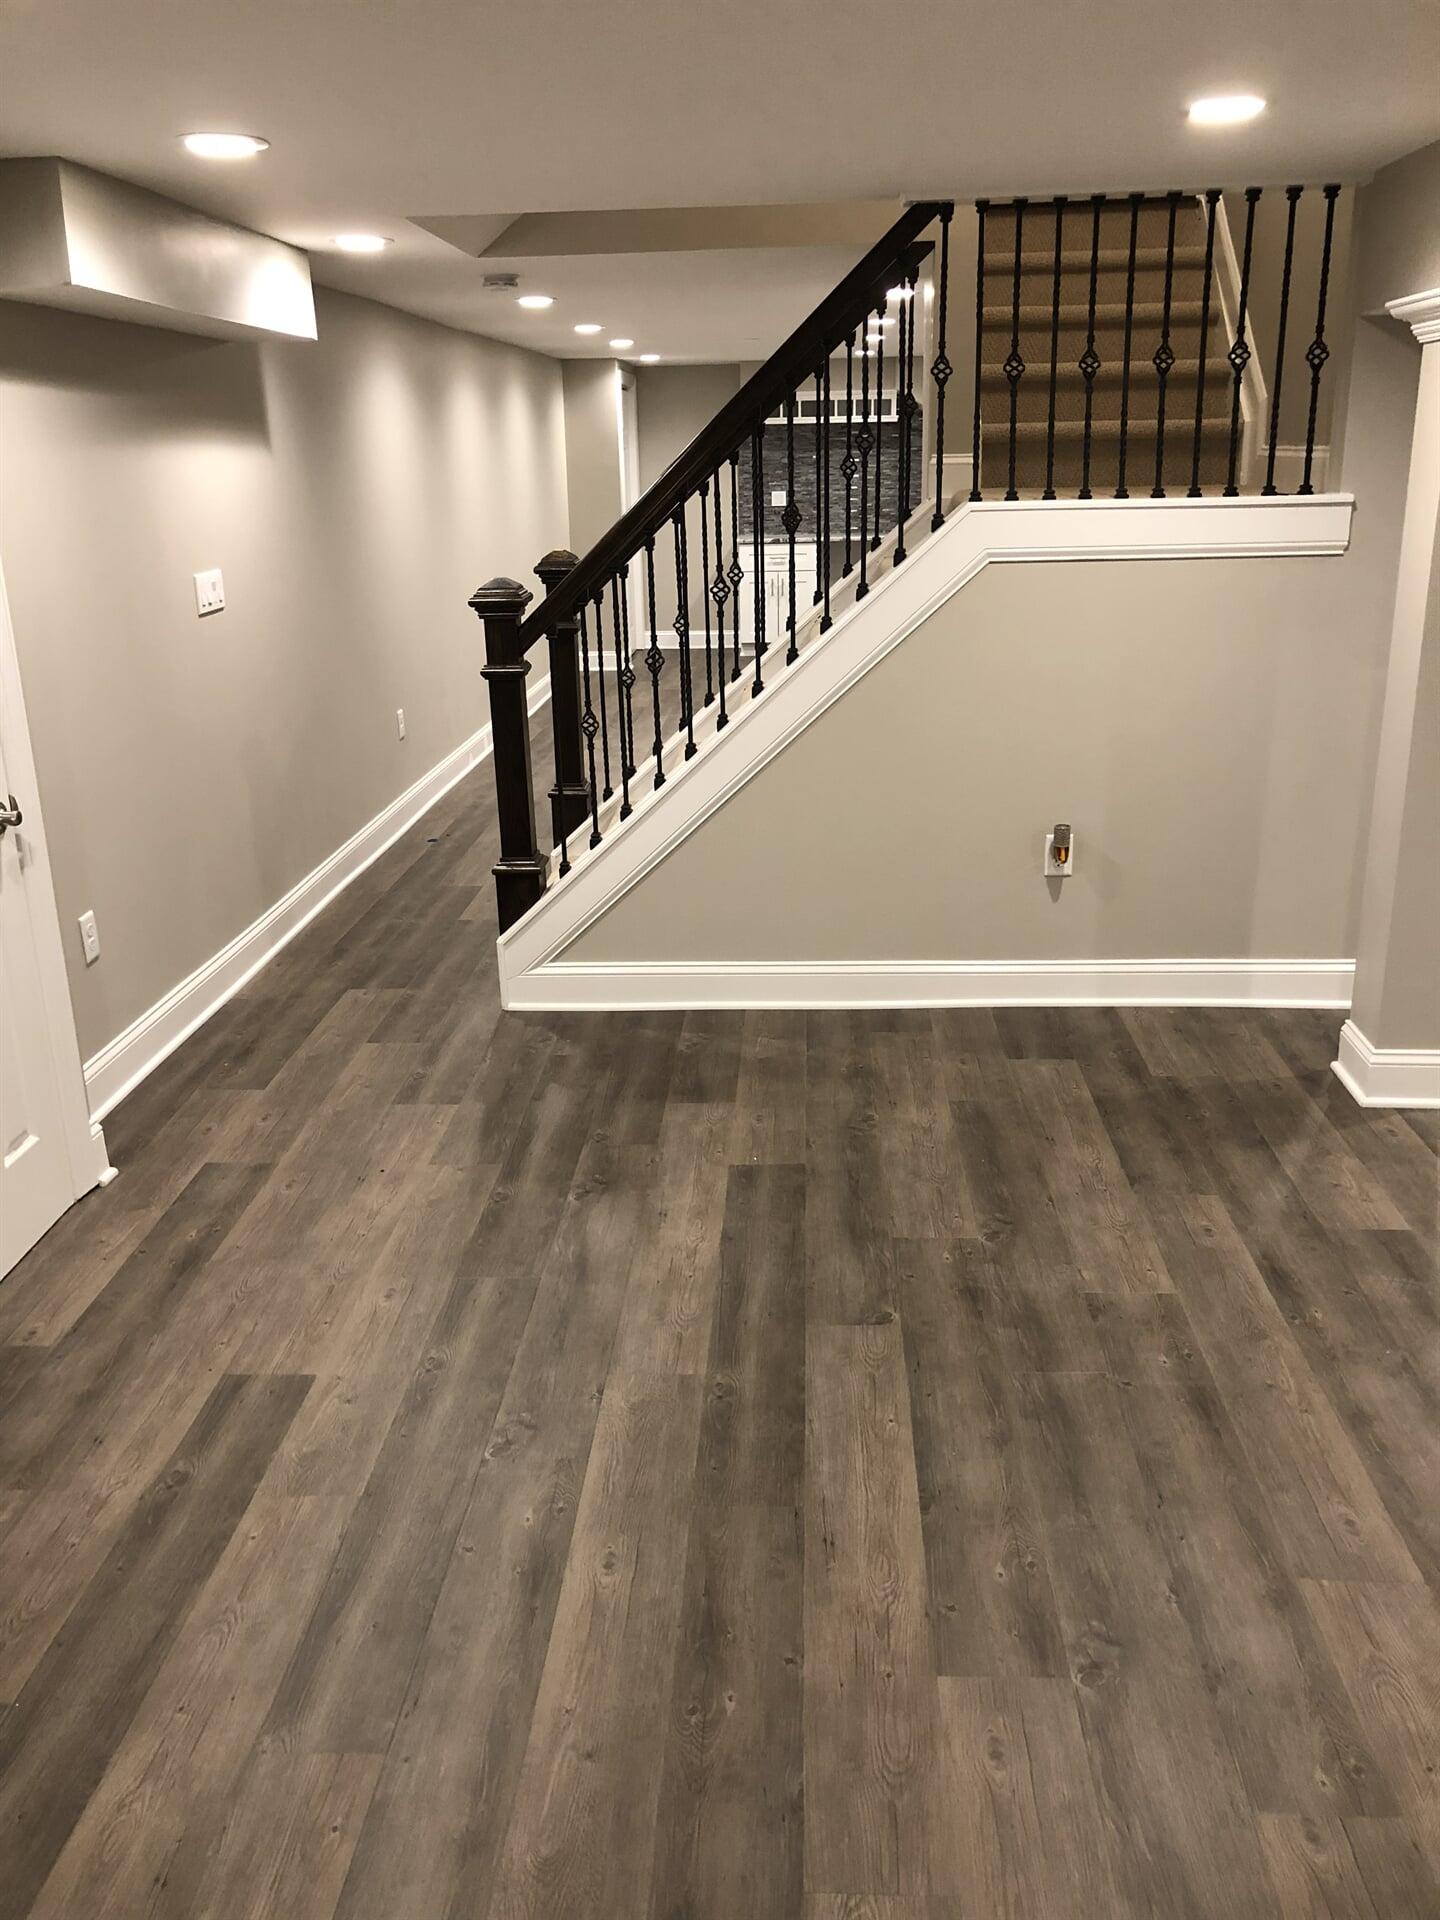 Hardwood flooring in Freehold, NJ from Carpet Yard